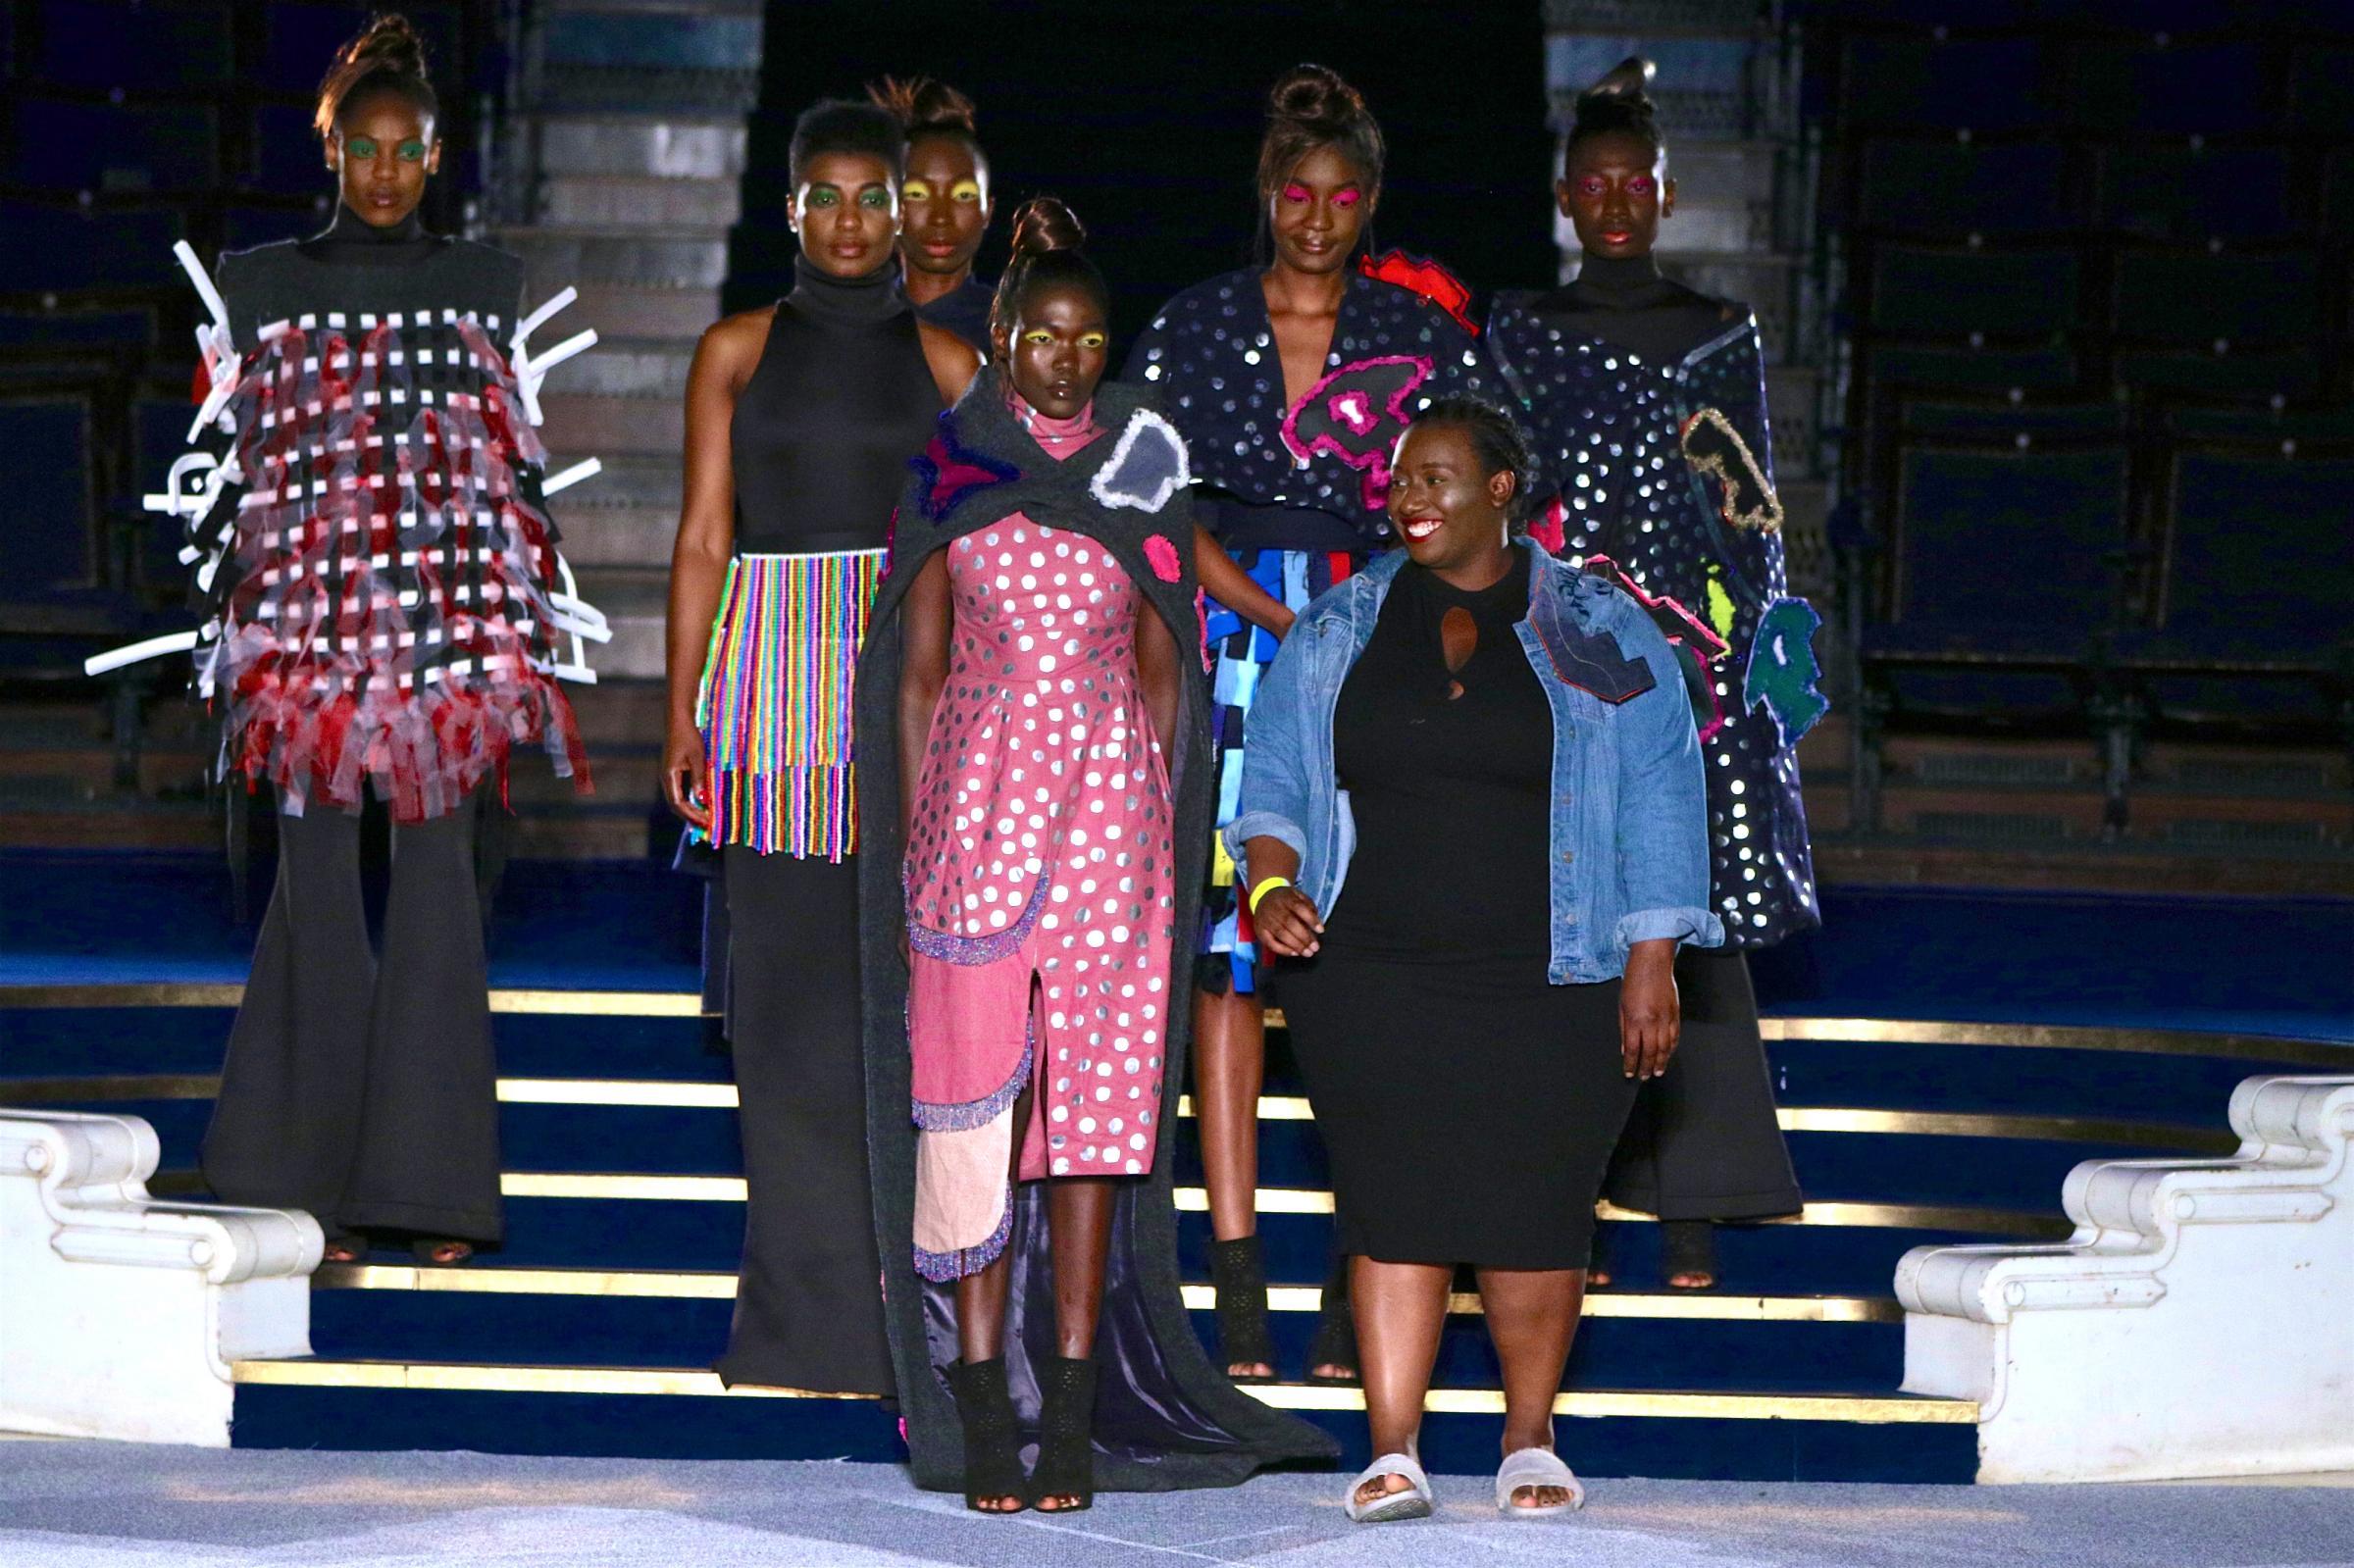 Nyasha Mabhunu (centre) with models wearing her designs on the catwalk